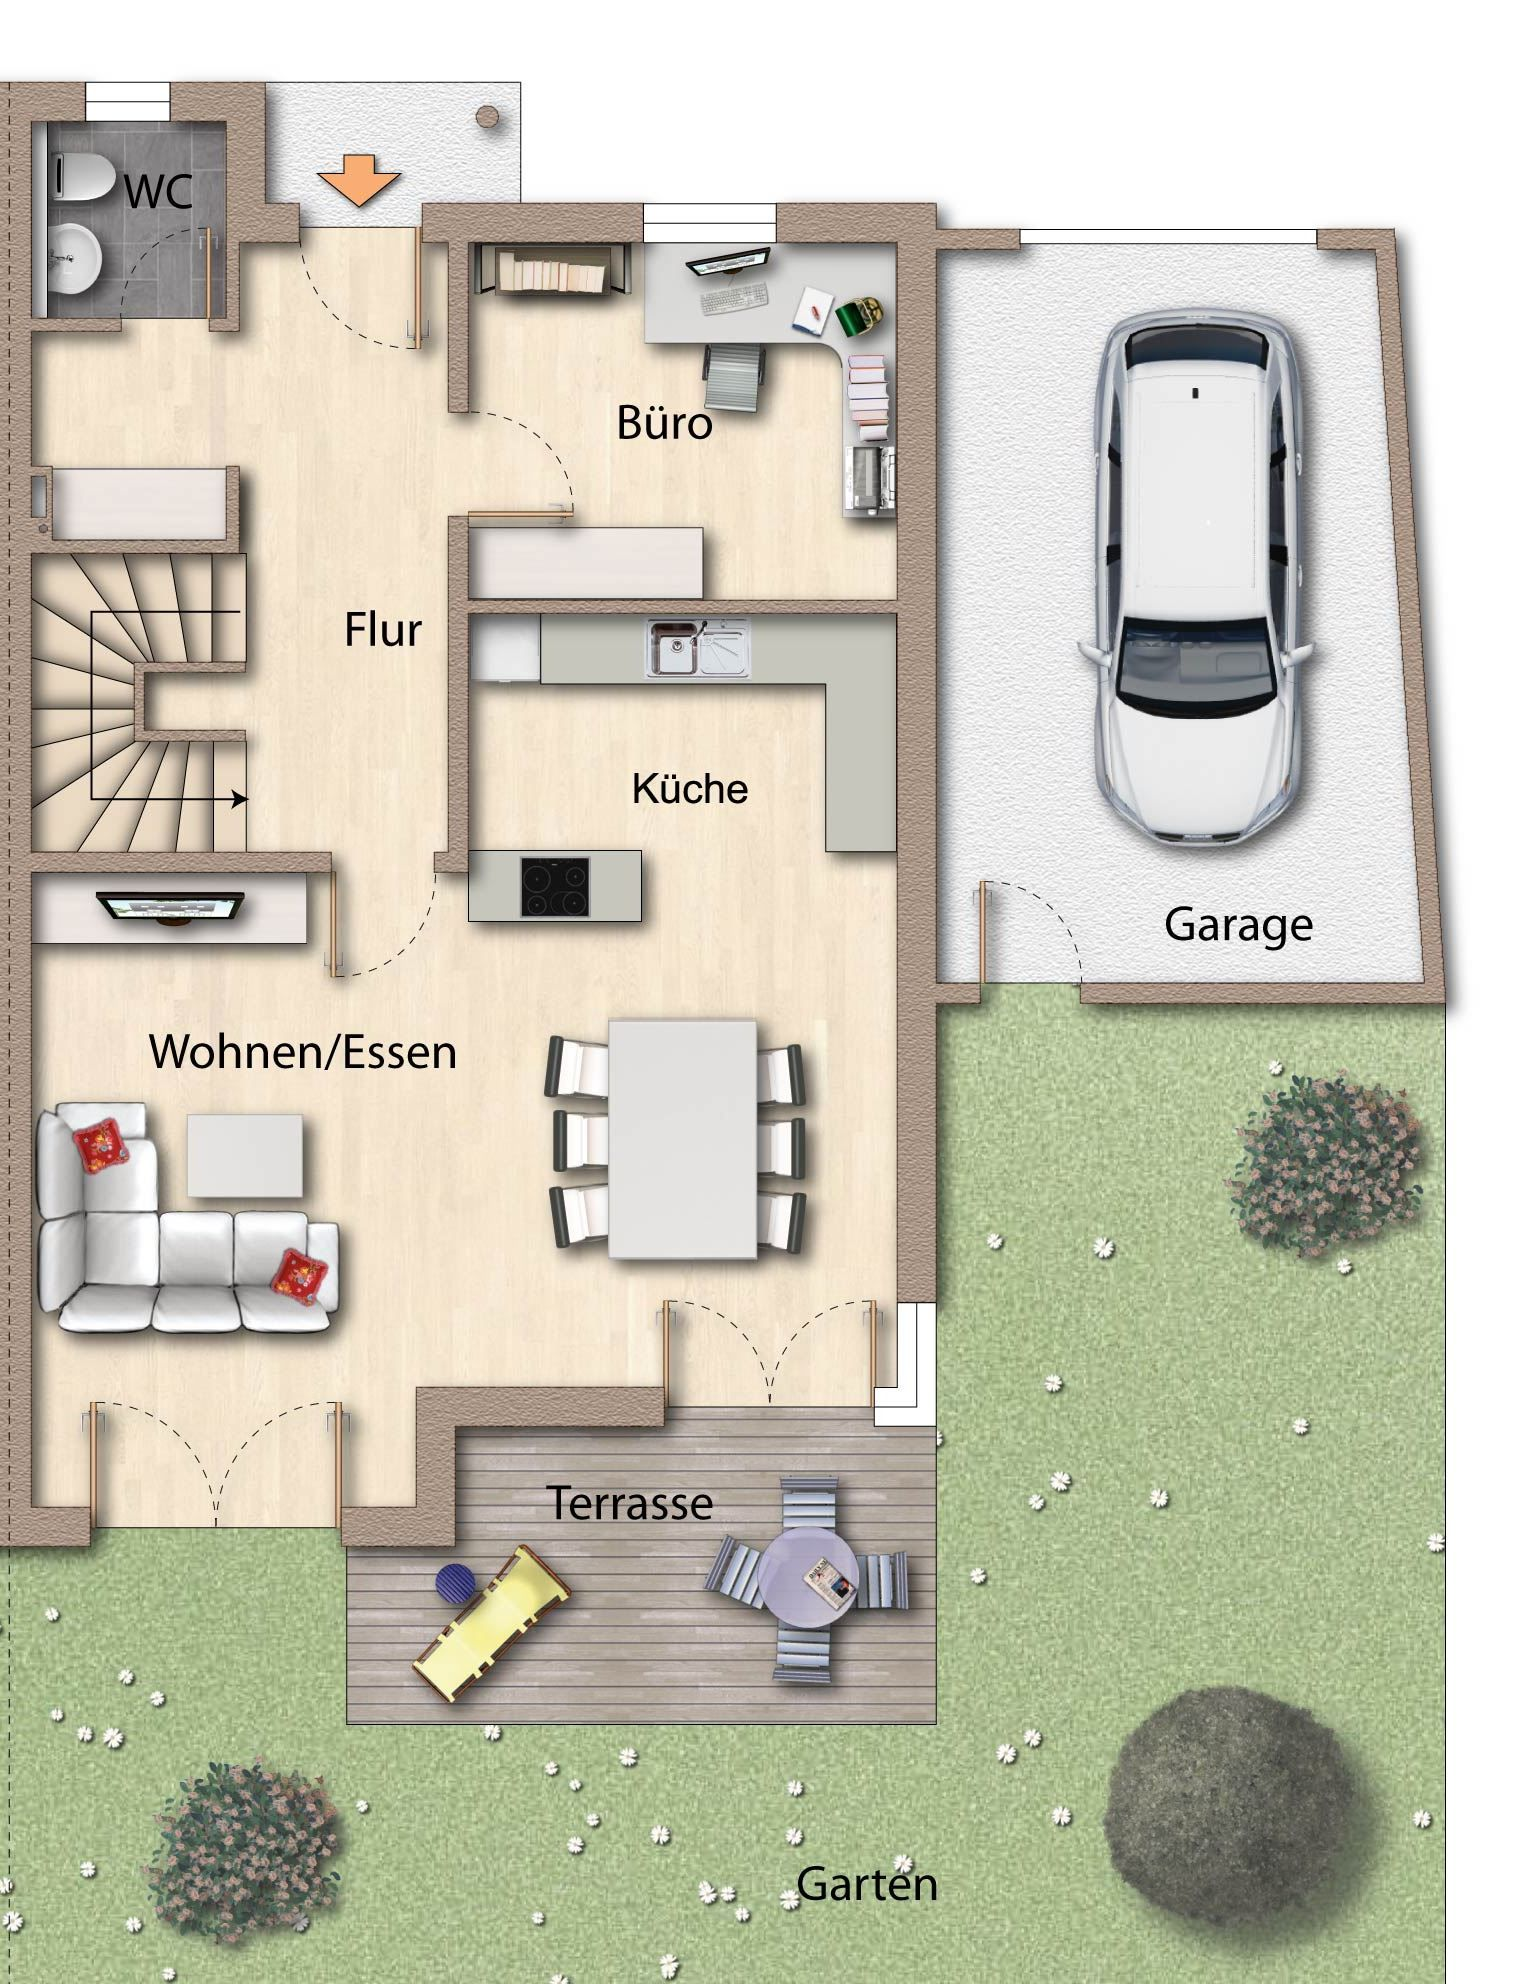 Doppelhaush lfte p lling haus pinterest for Modernes haus raumaufteilung